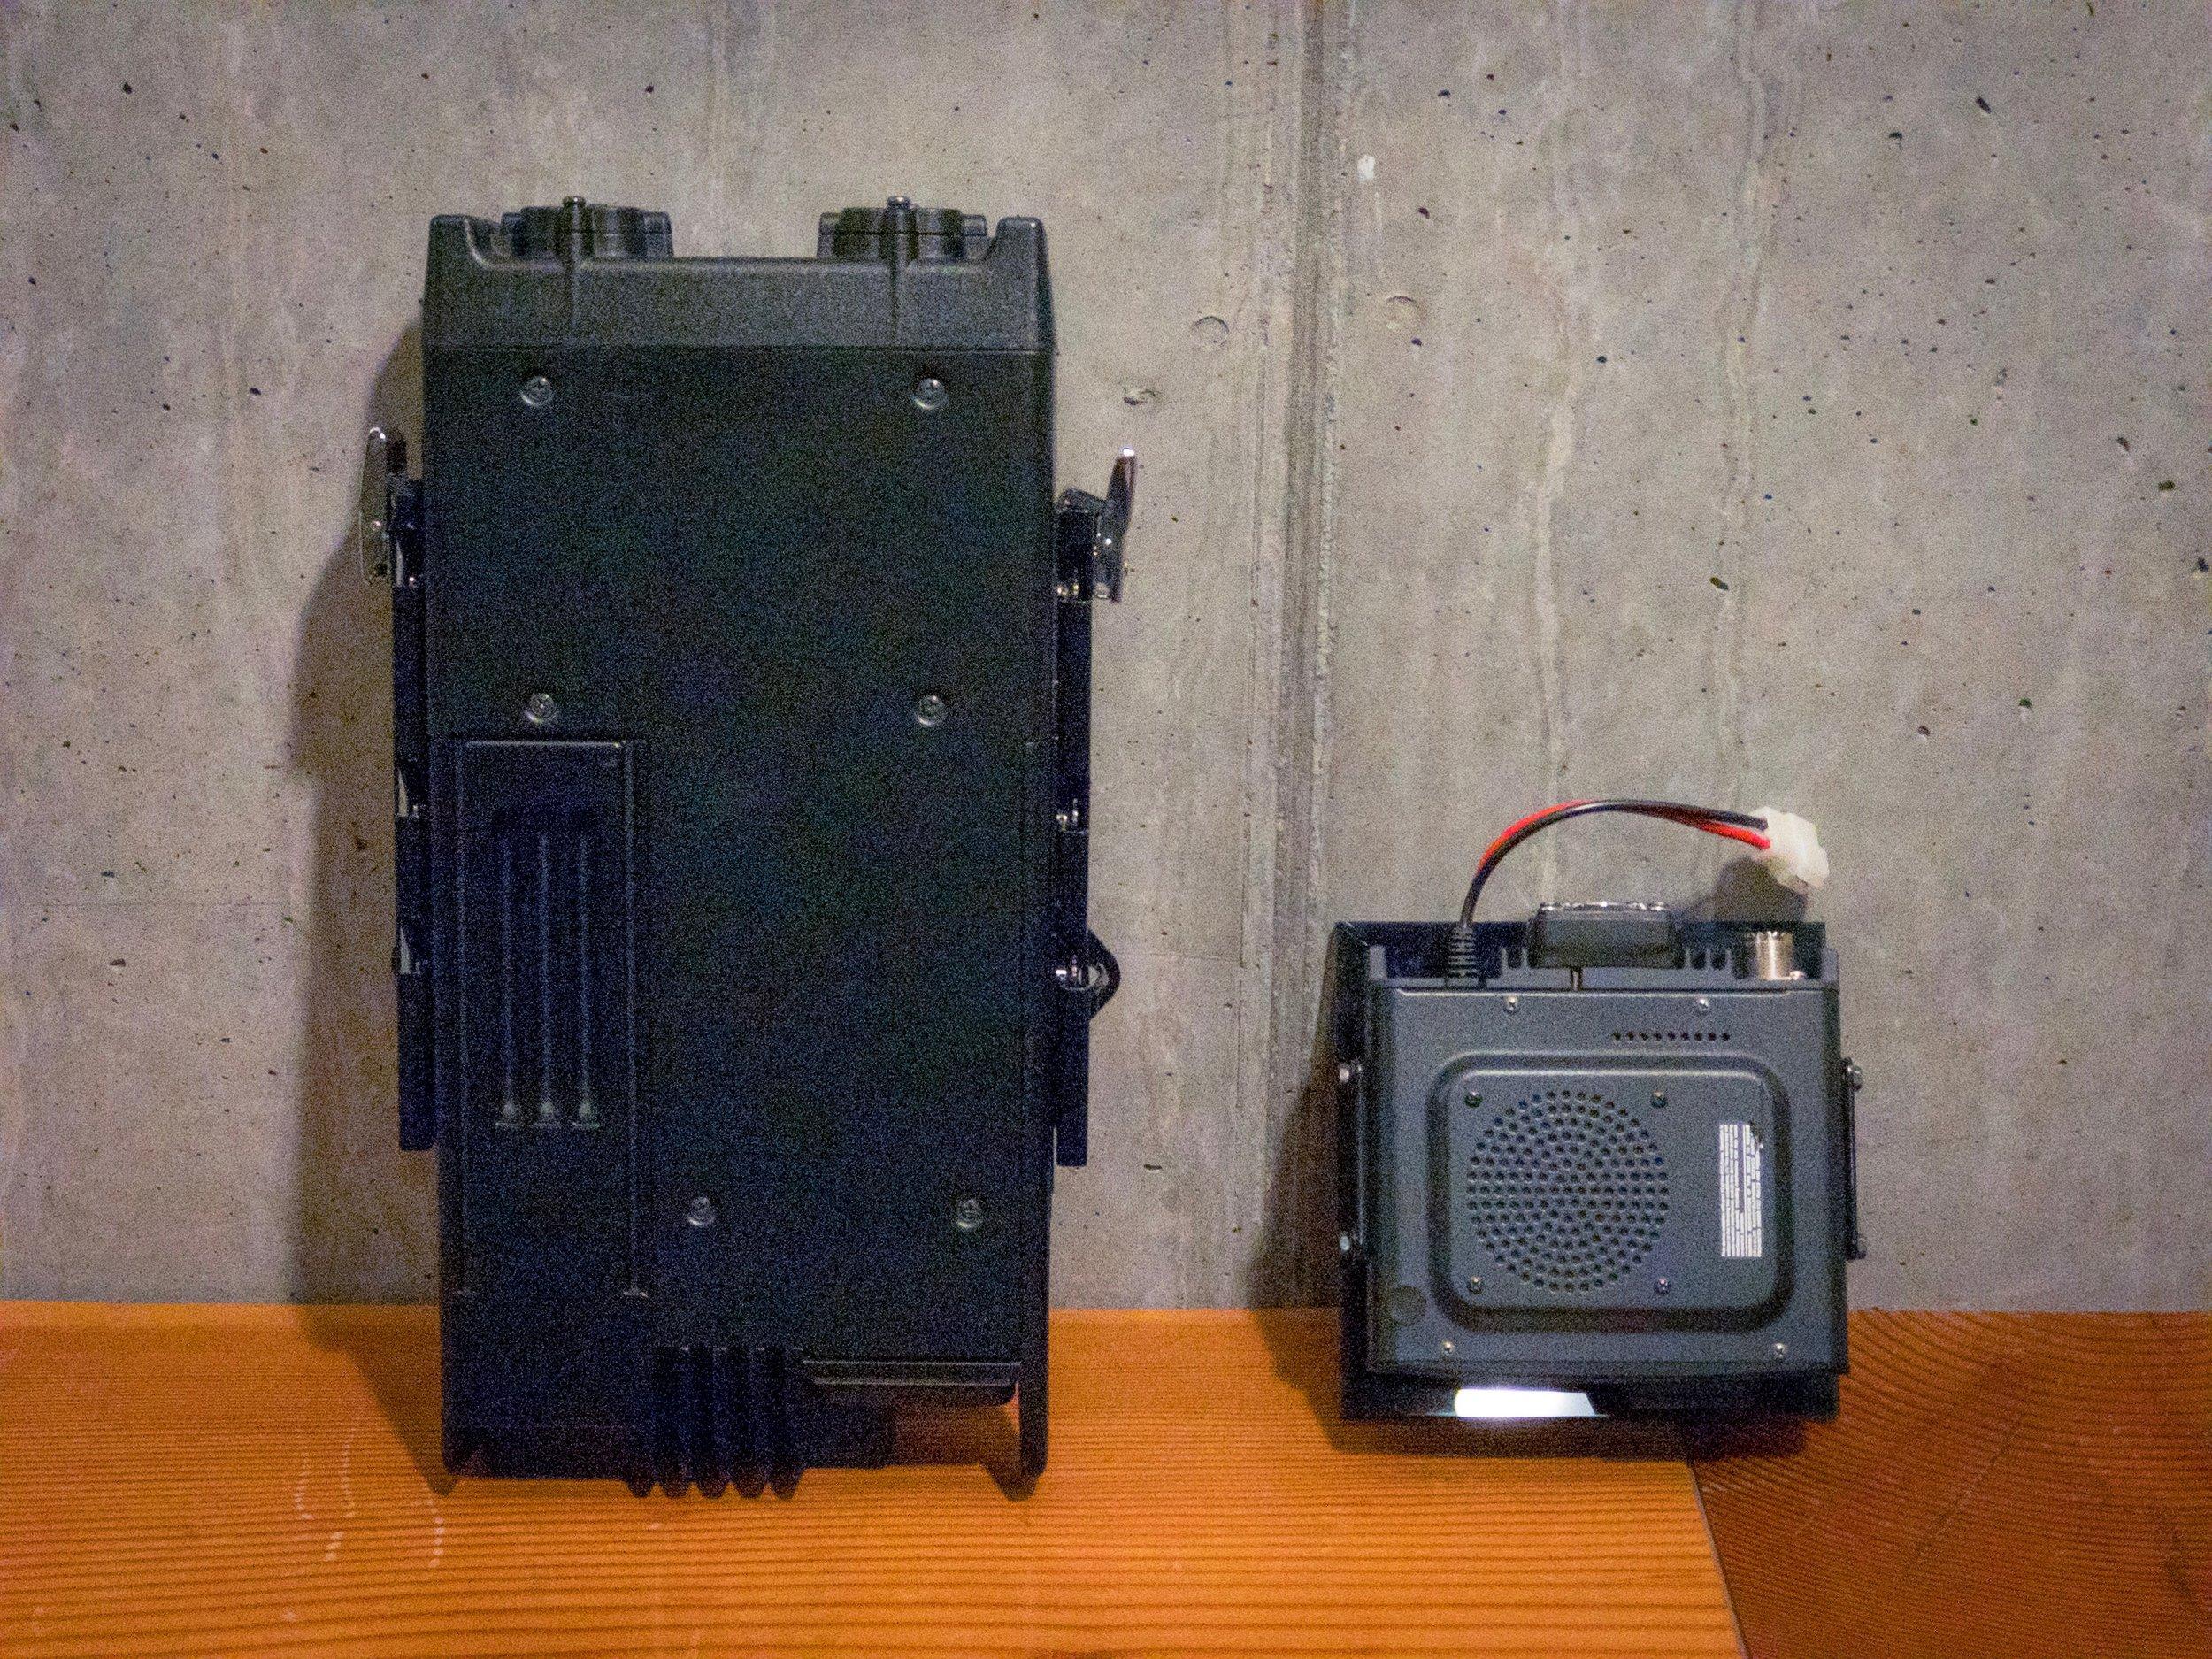 Size comparison between the base units of the Kenwood VHF radio, and Yaesu Ham radio, respectively.